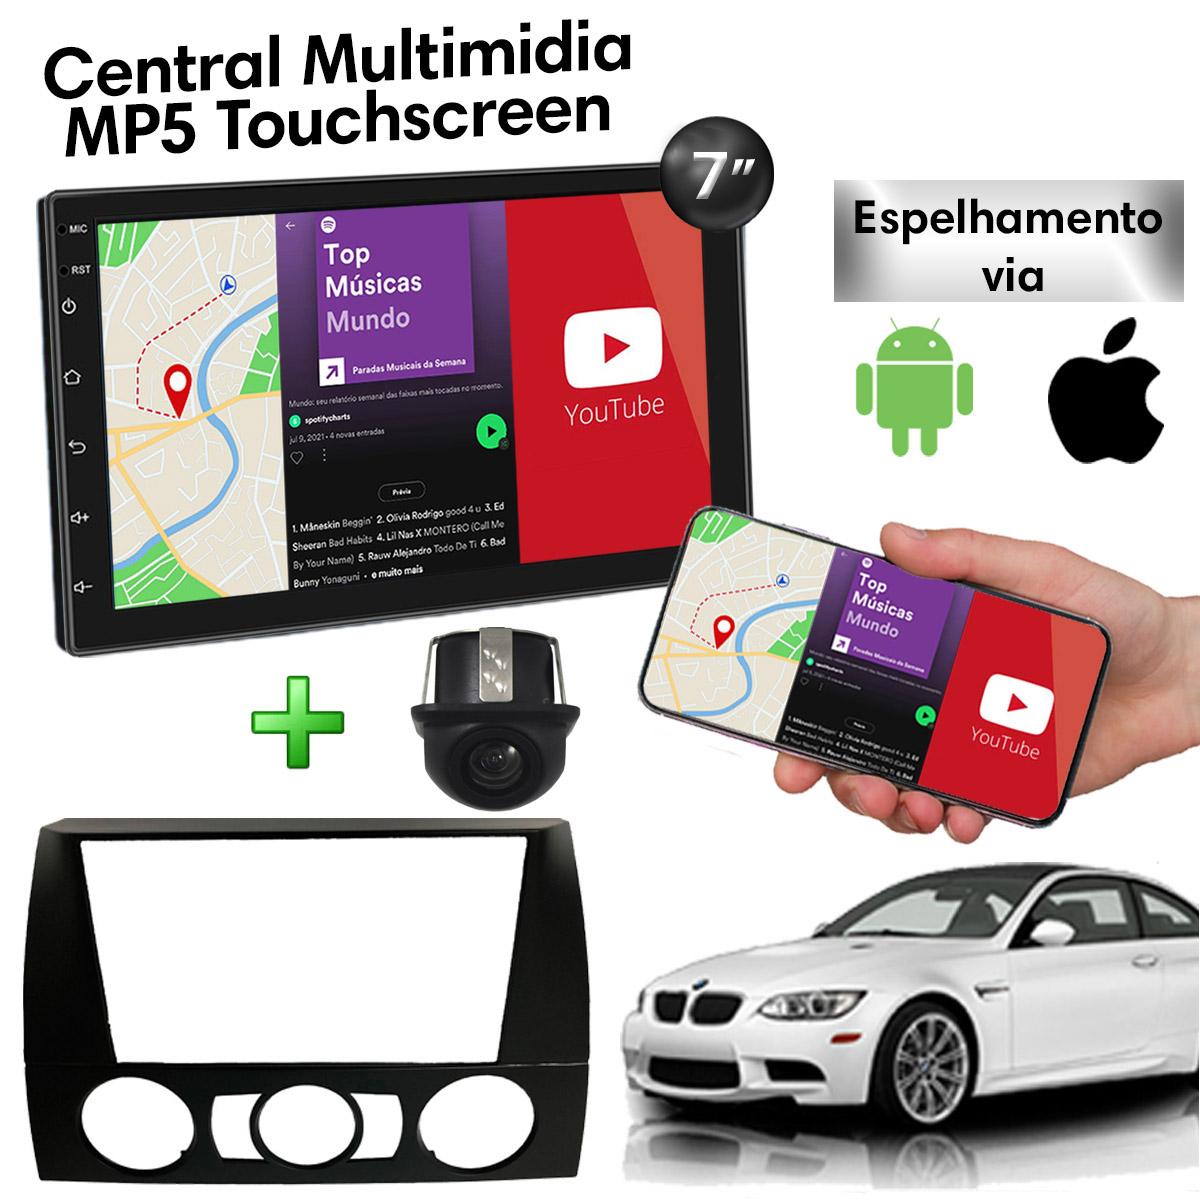 Central Multimidia com Moldura BMW Series 3 Mp5 Bluetooth Usb Touchscreen 7 Polegadas 2 Din Poliparts